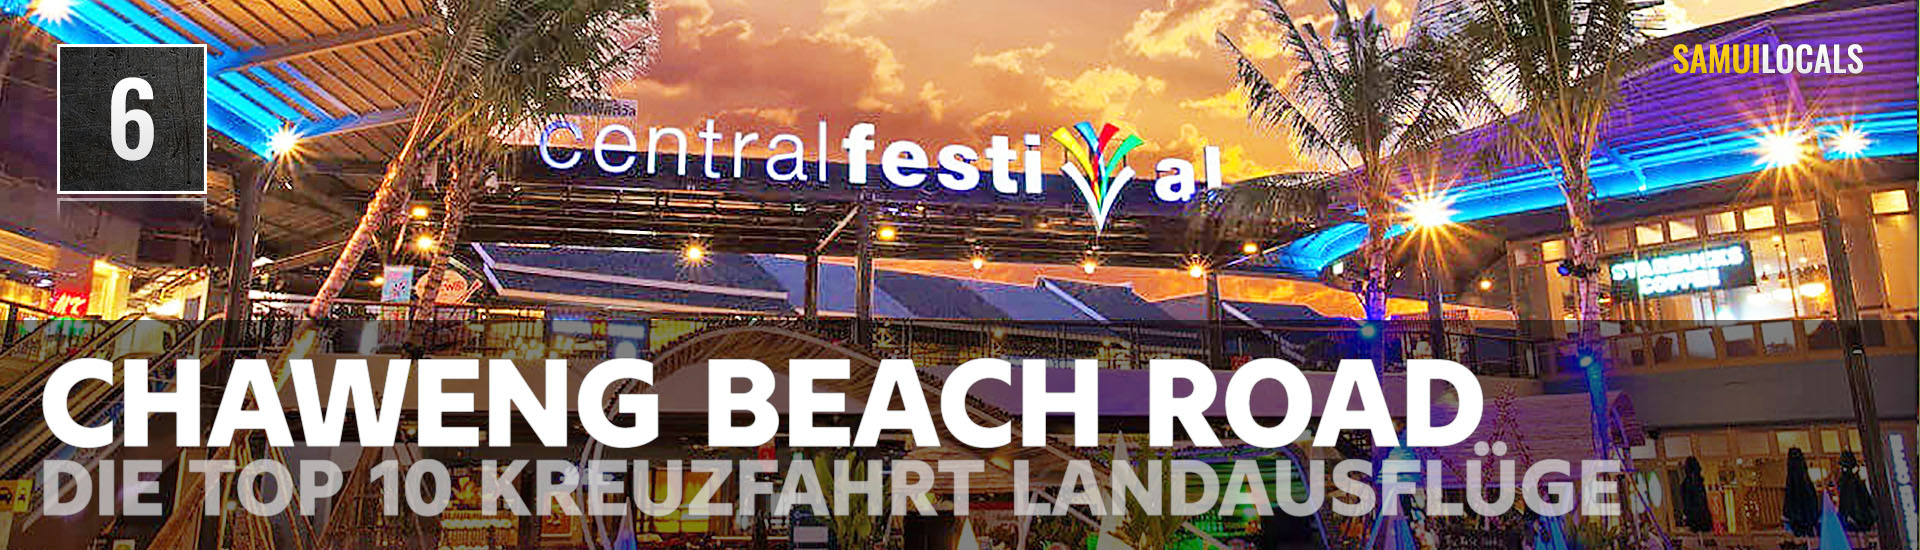 top_10_kreuzfahrt_landausfluege_chawneg_beach_road